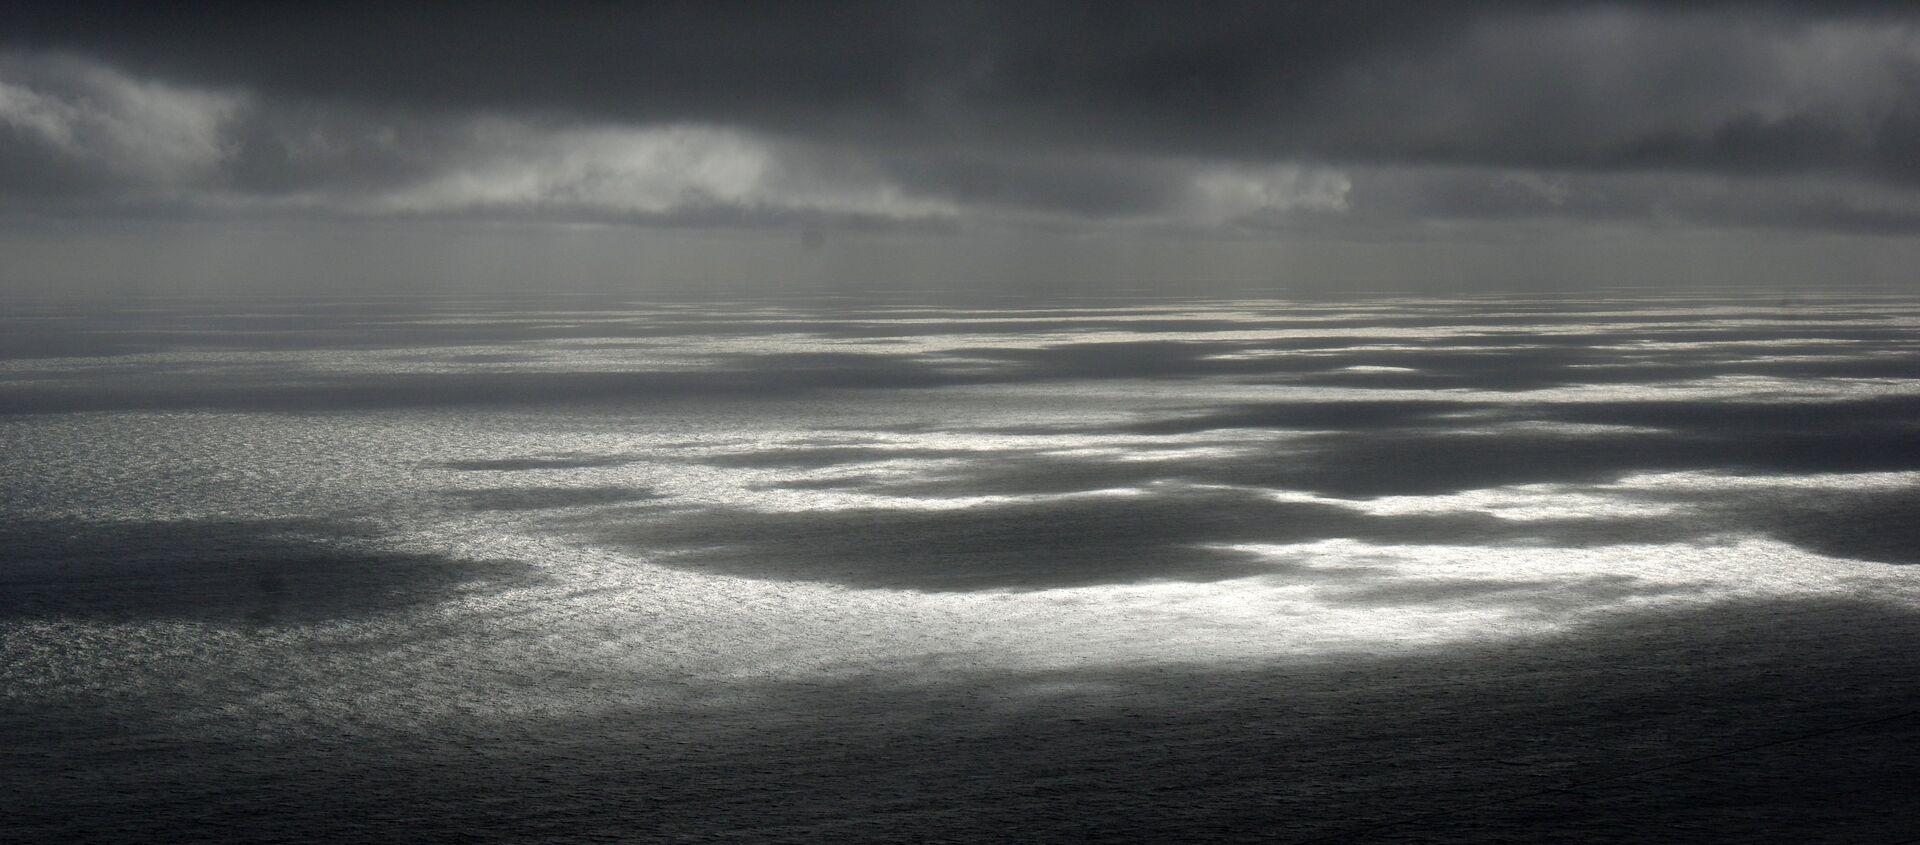 Krym, Morze Czarne - Sputnik Polska, 1920, 20.04.2021